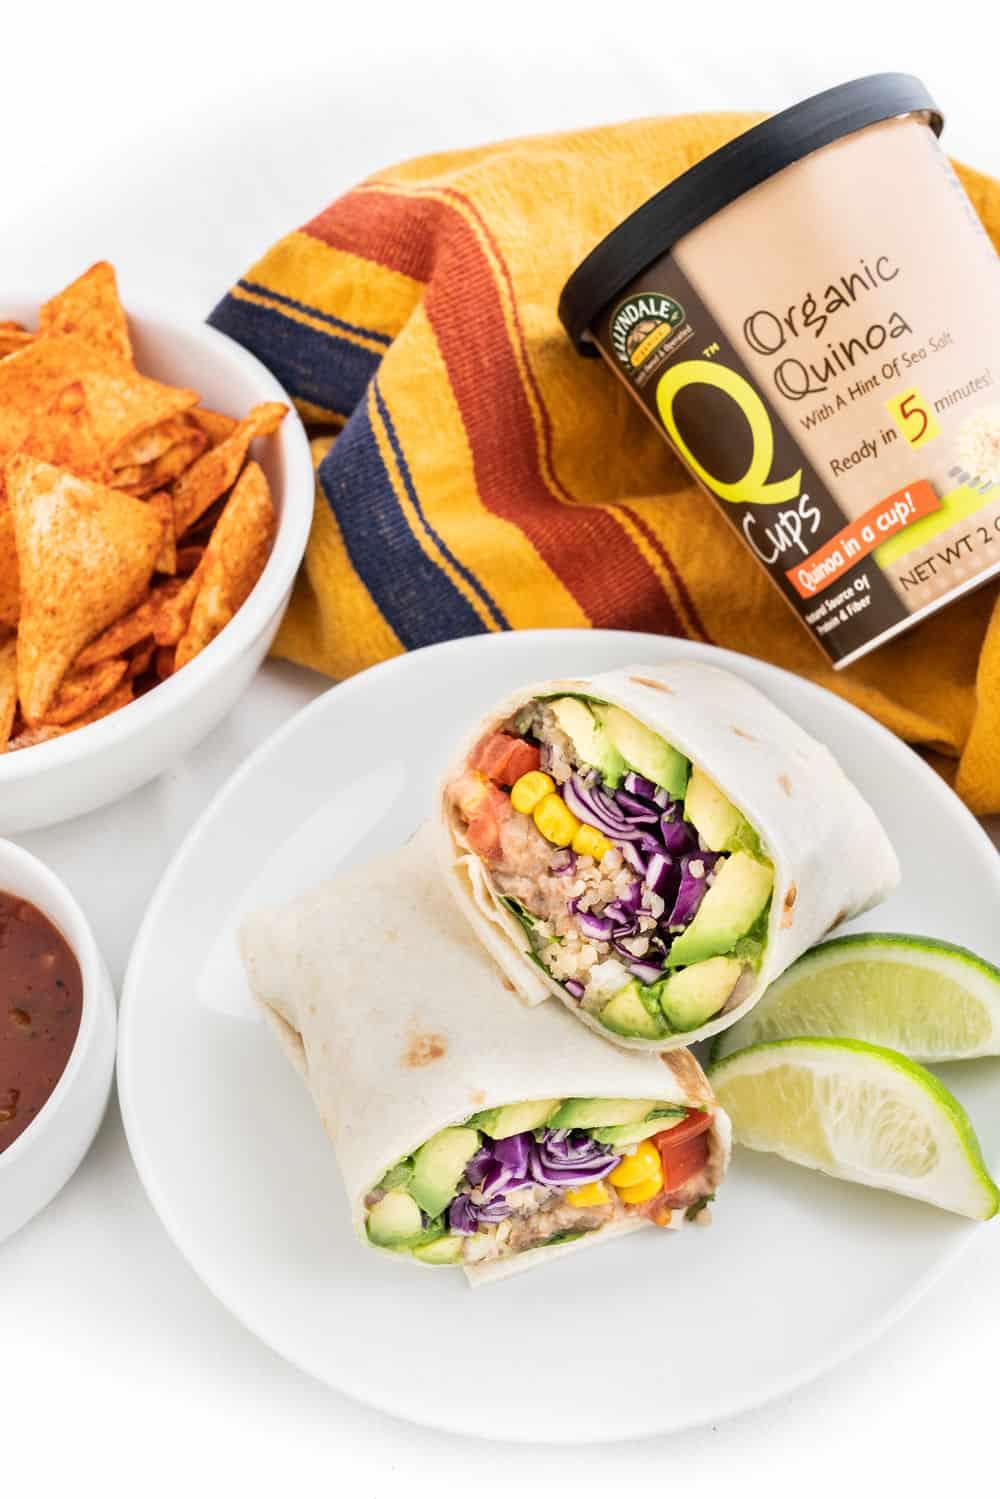 Super Easy Vegan Burrito   Worldofvegan.com   #burrito #lunch #quinoa #healthy #mexican #worldofvegan